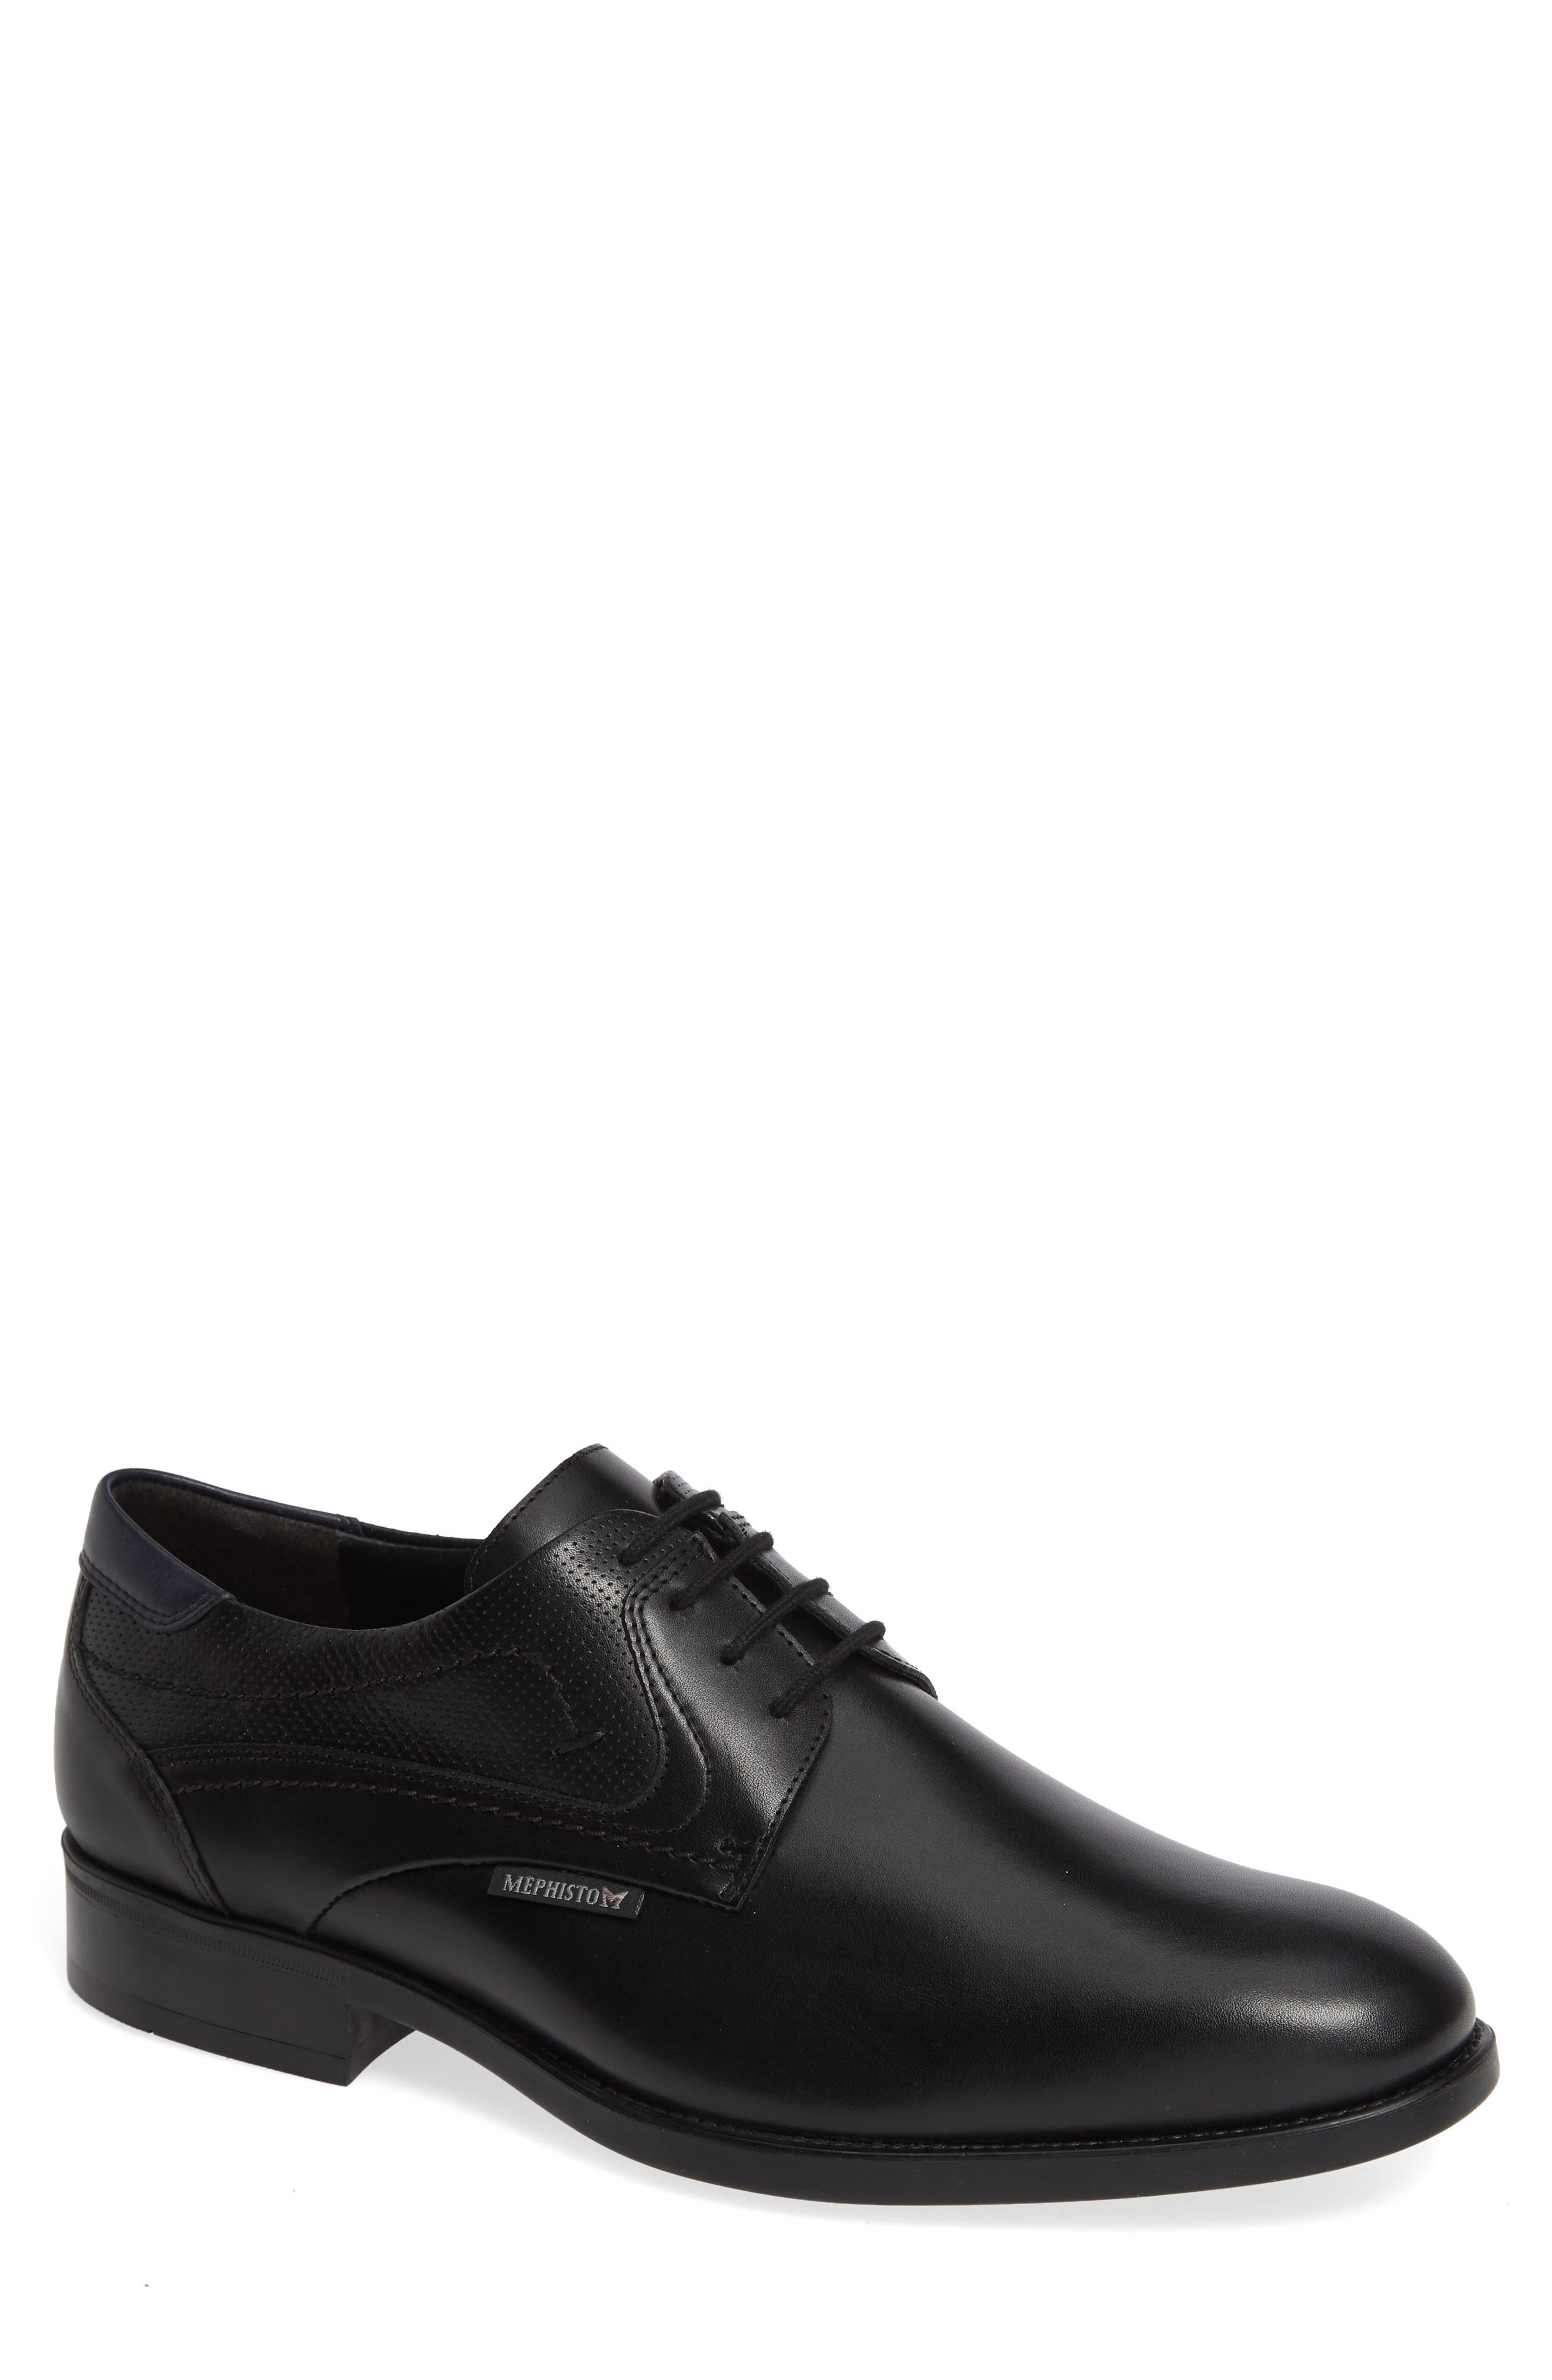 Cirus Plain Toe Derby, Main, color, BLACK/ NAVY LEATHER